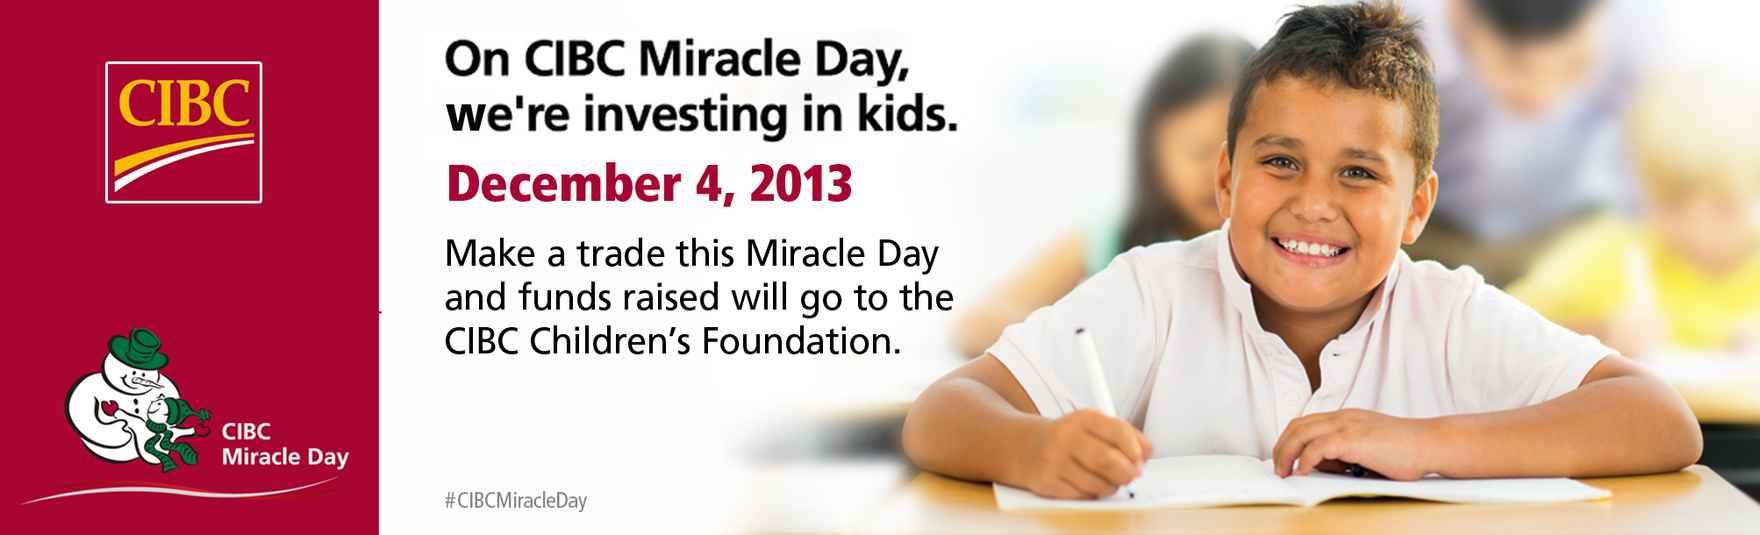 Miracle-Day-Creative-Nov-28th.jpg